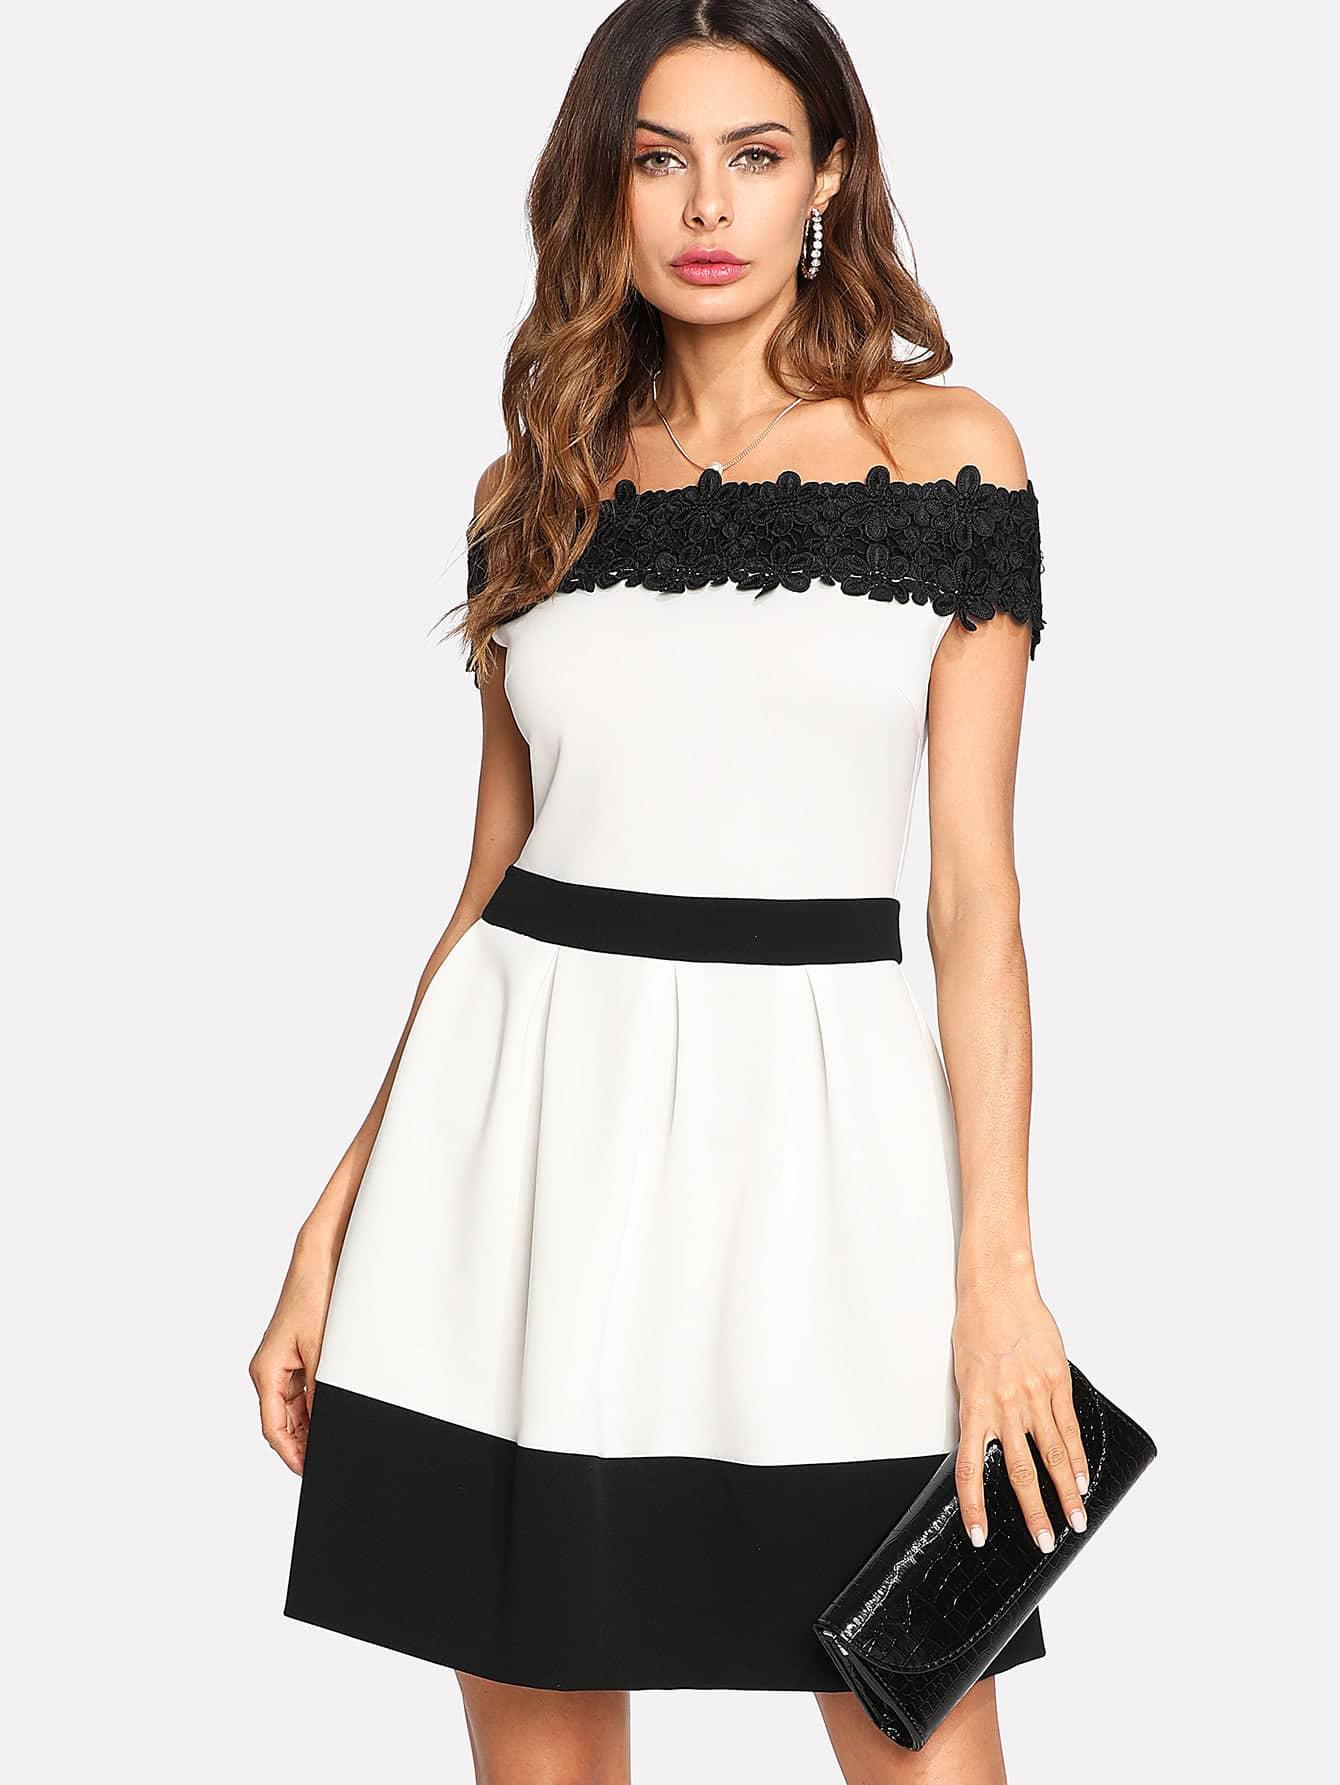 Daisy Lace Applique Two Tone Bardot Dress